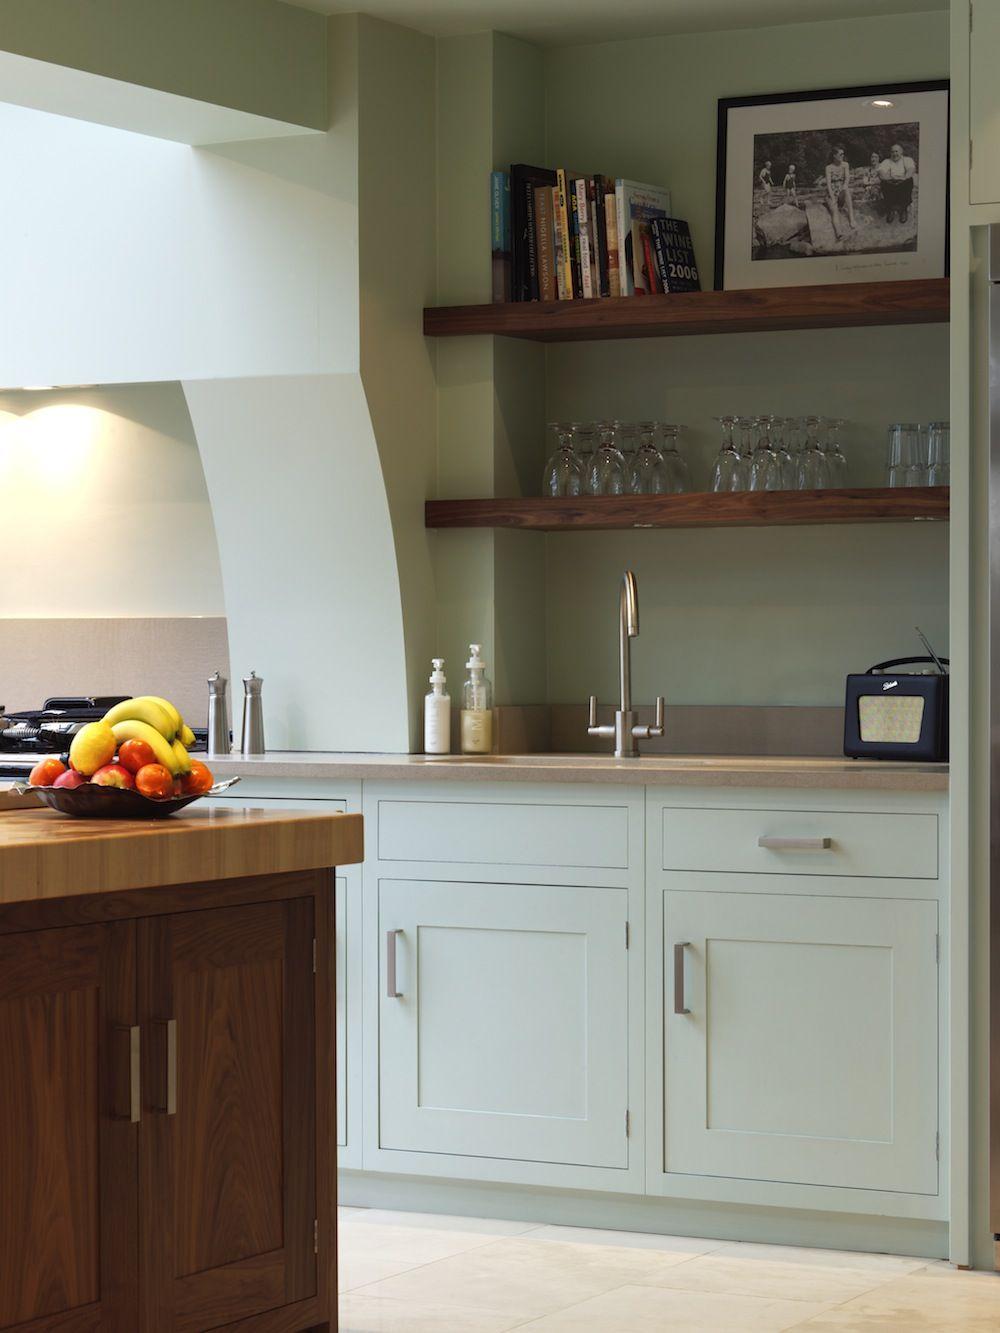 Tom howley beaconsfield | New kitchen | Pinterest | Toms, Kitchen ...